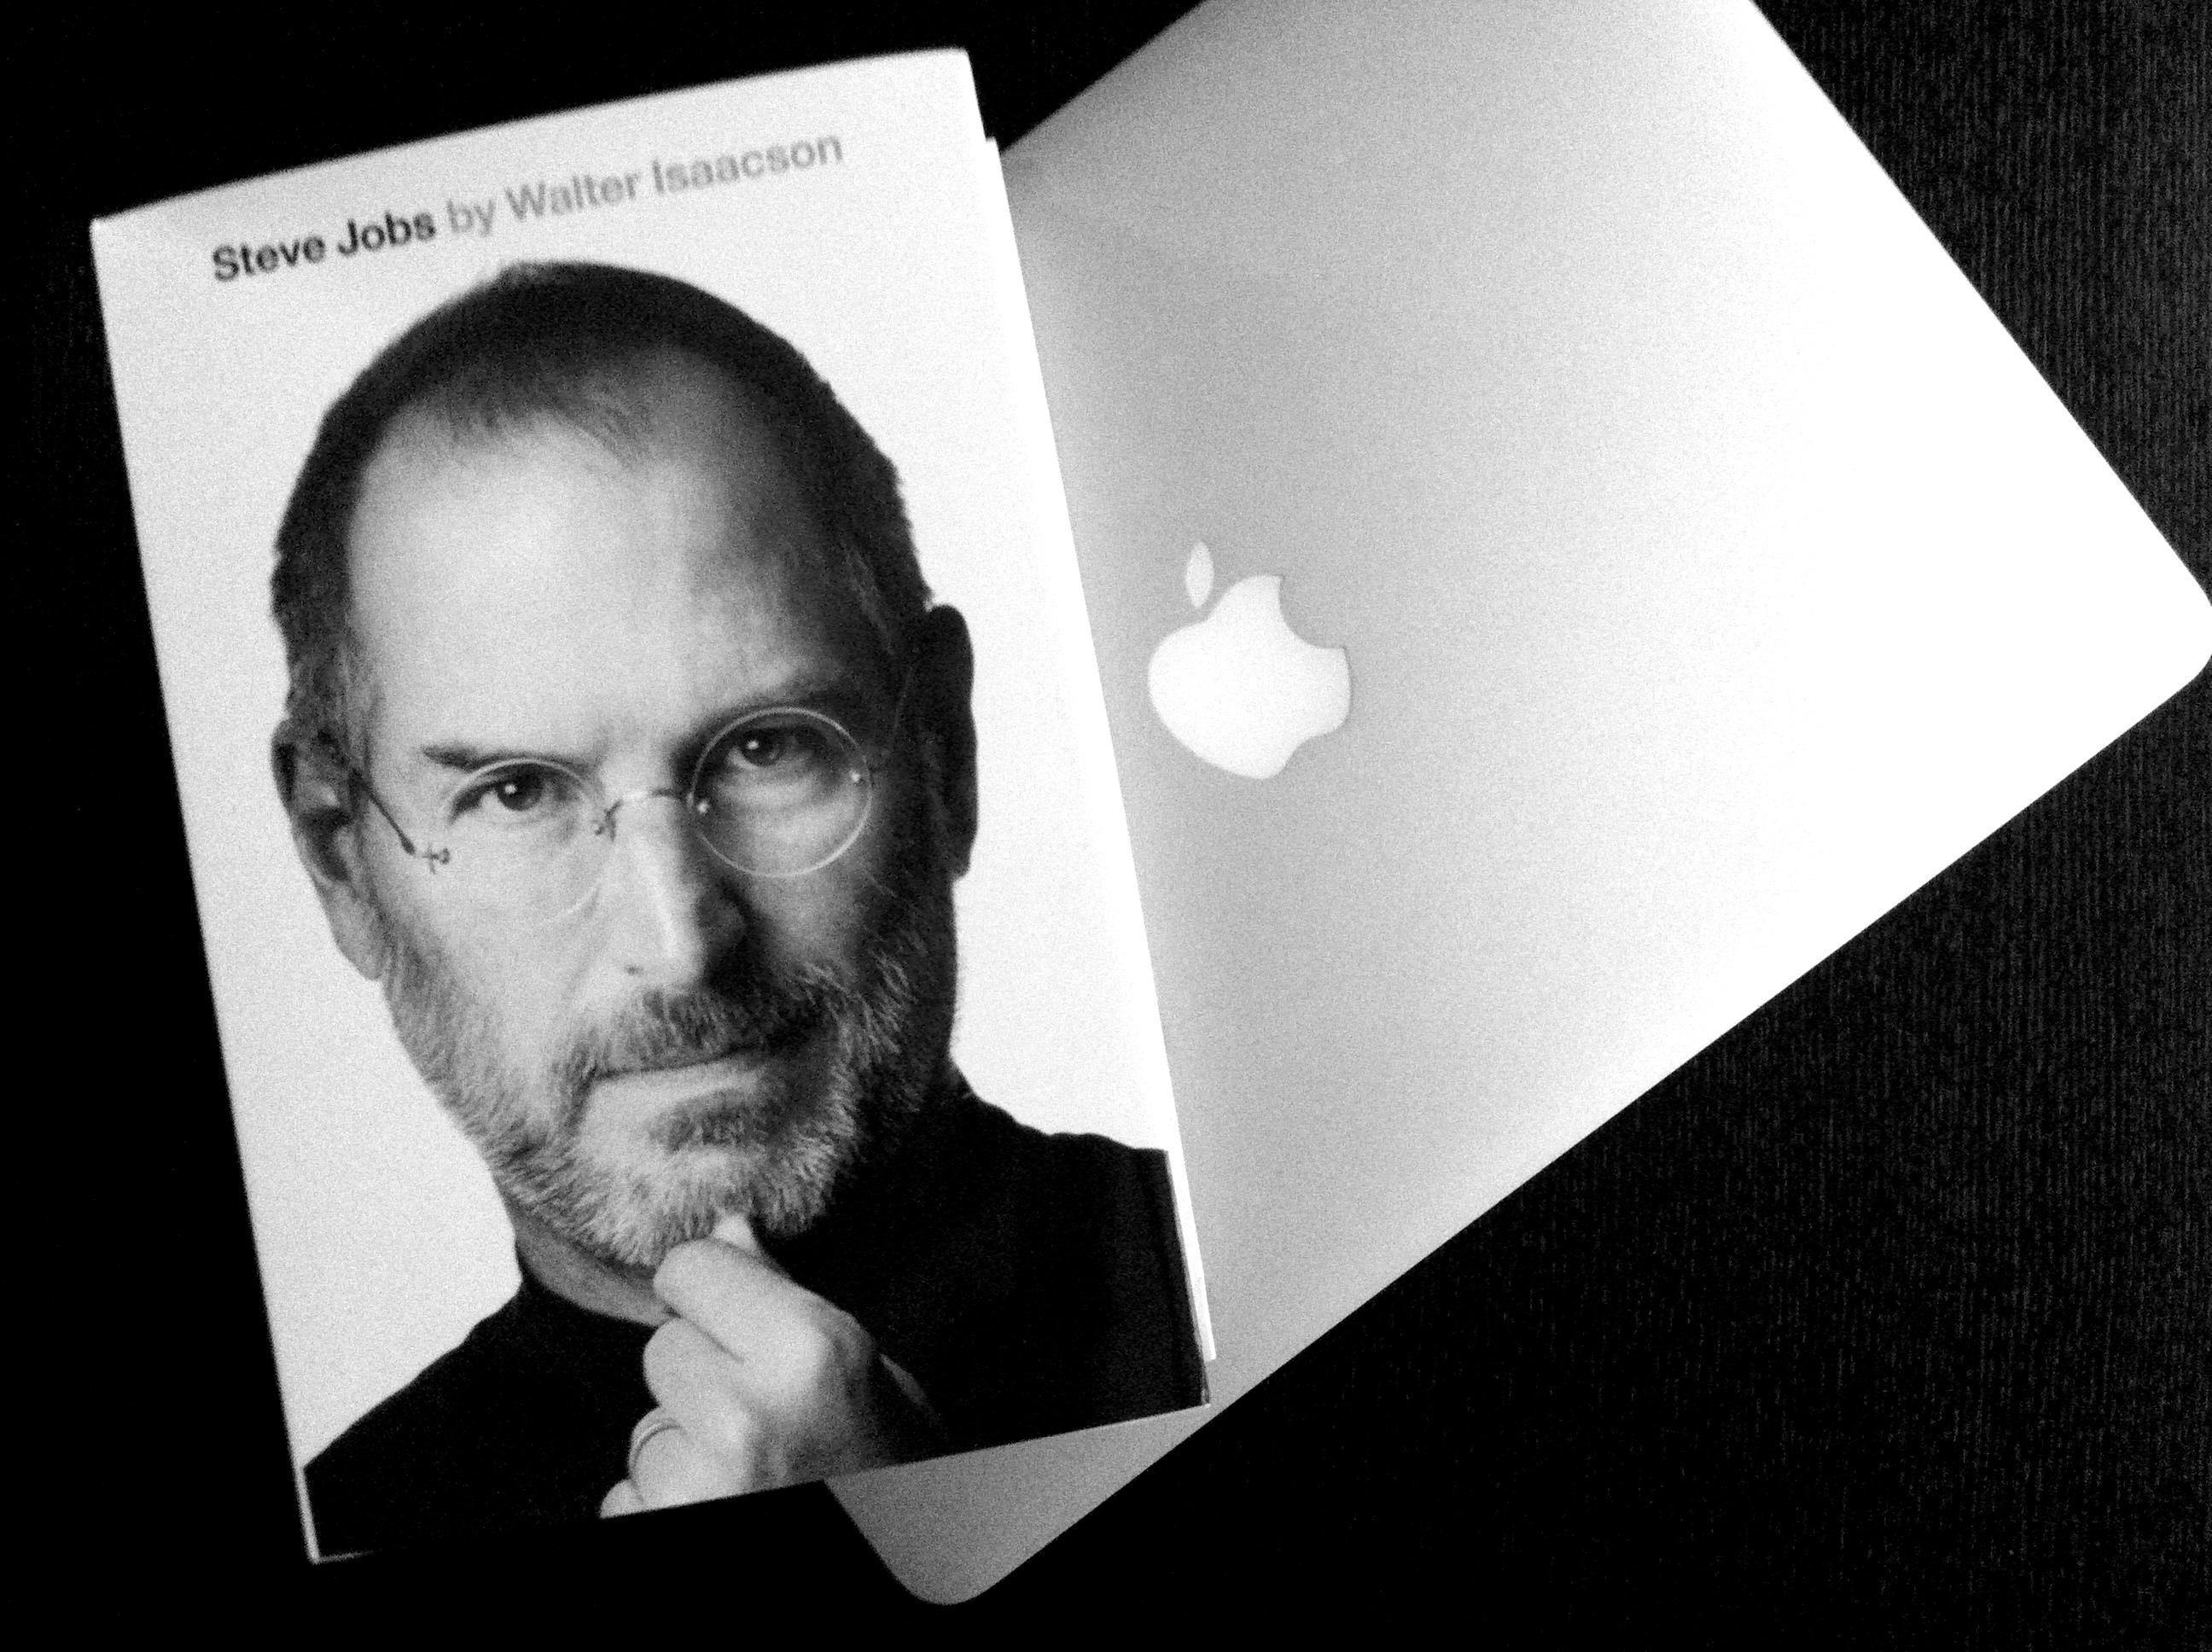 Steve Jobs d e Walter Isaacson